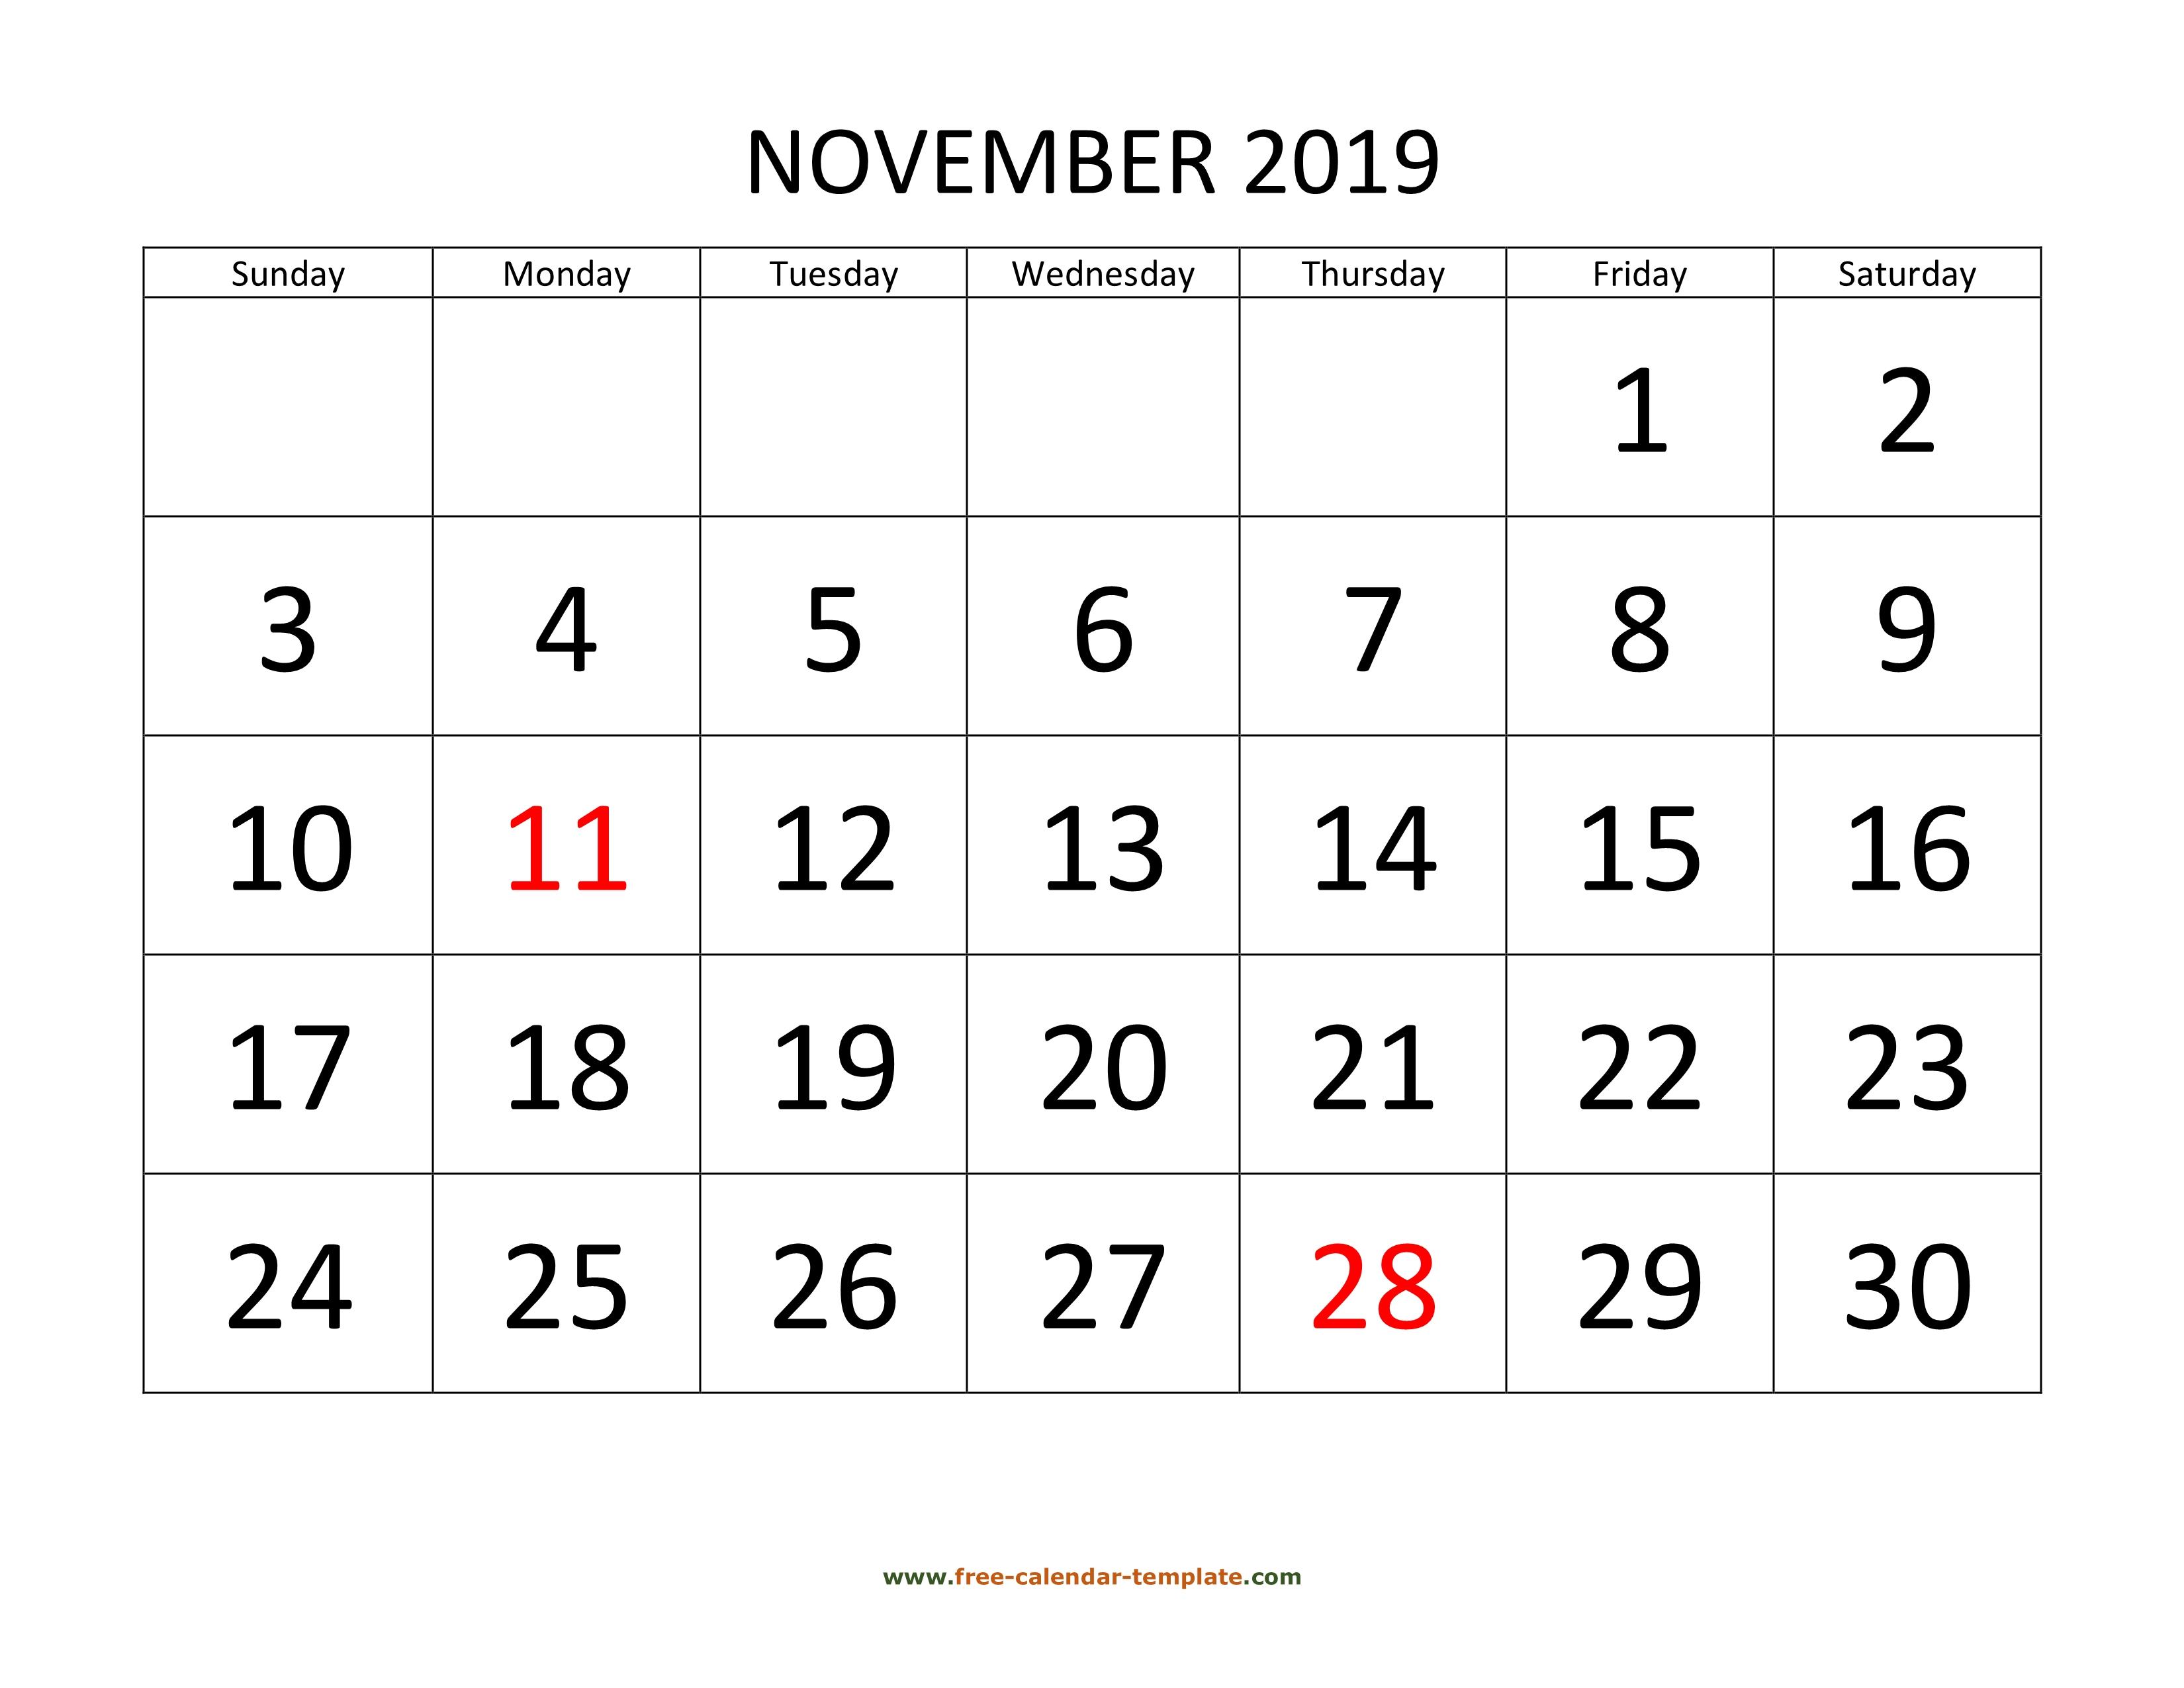 November 2019 Free Calendar Tempplate | Free-Calendar with Free Printable 2020 Calendars Large Numbers